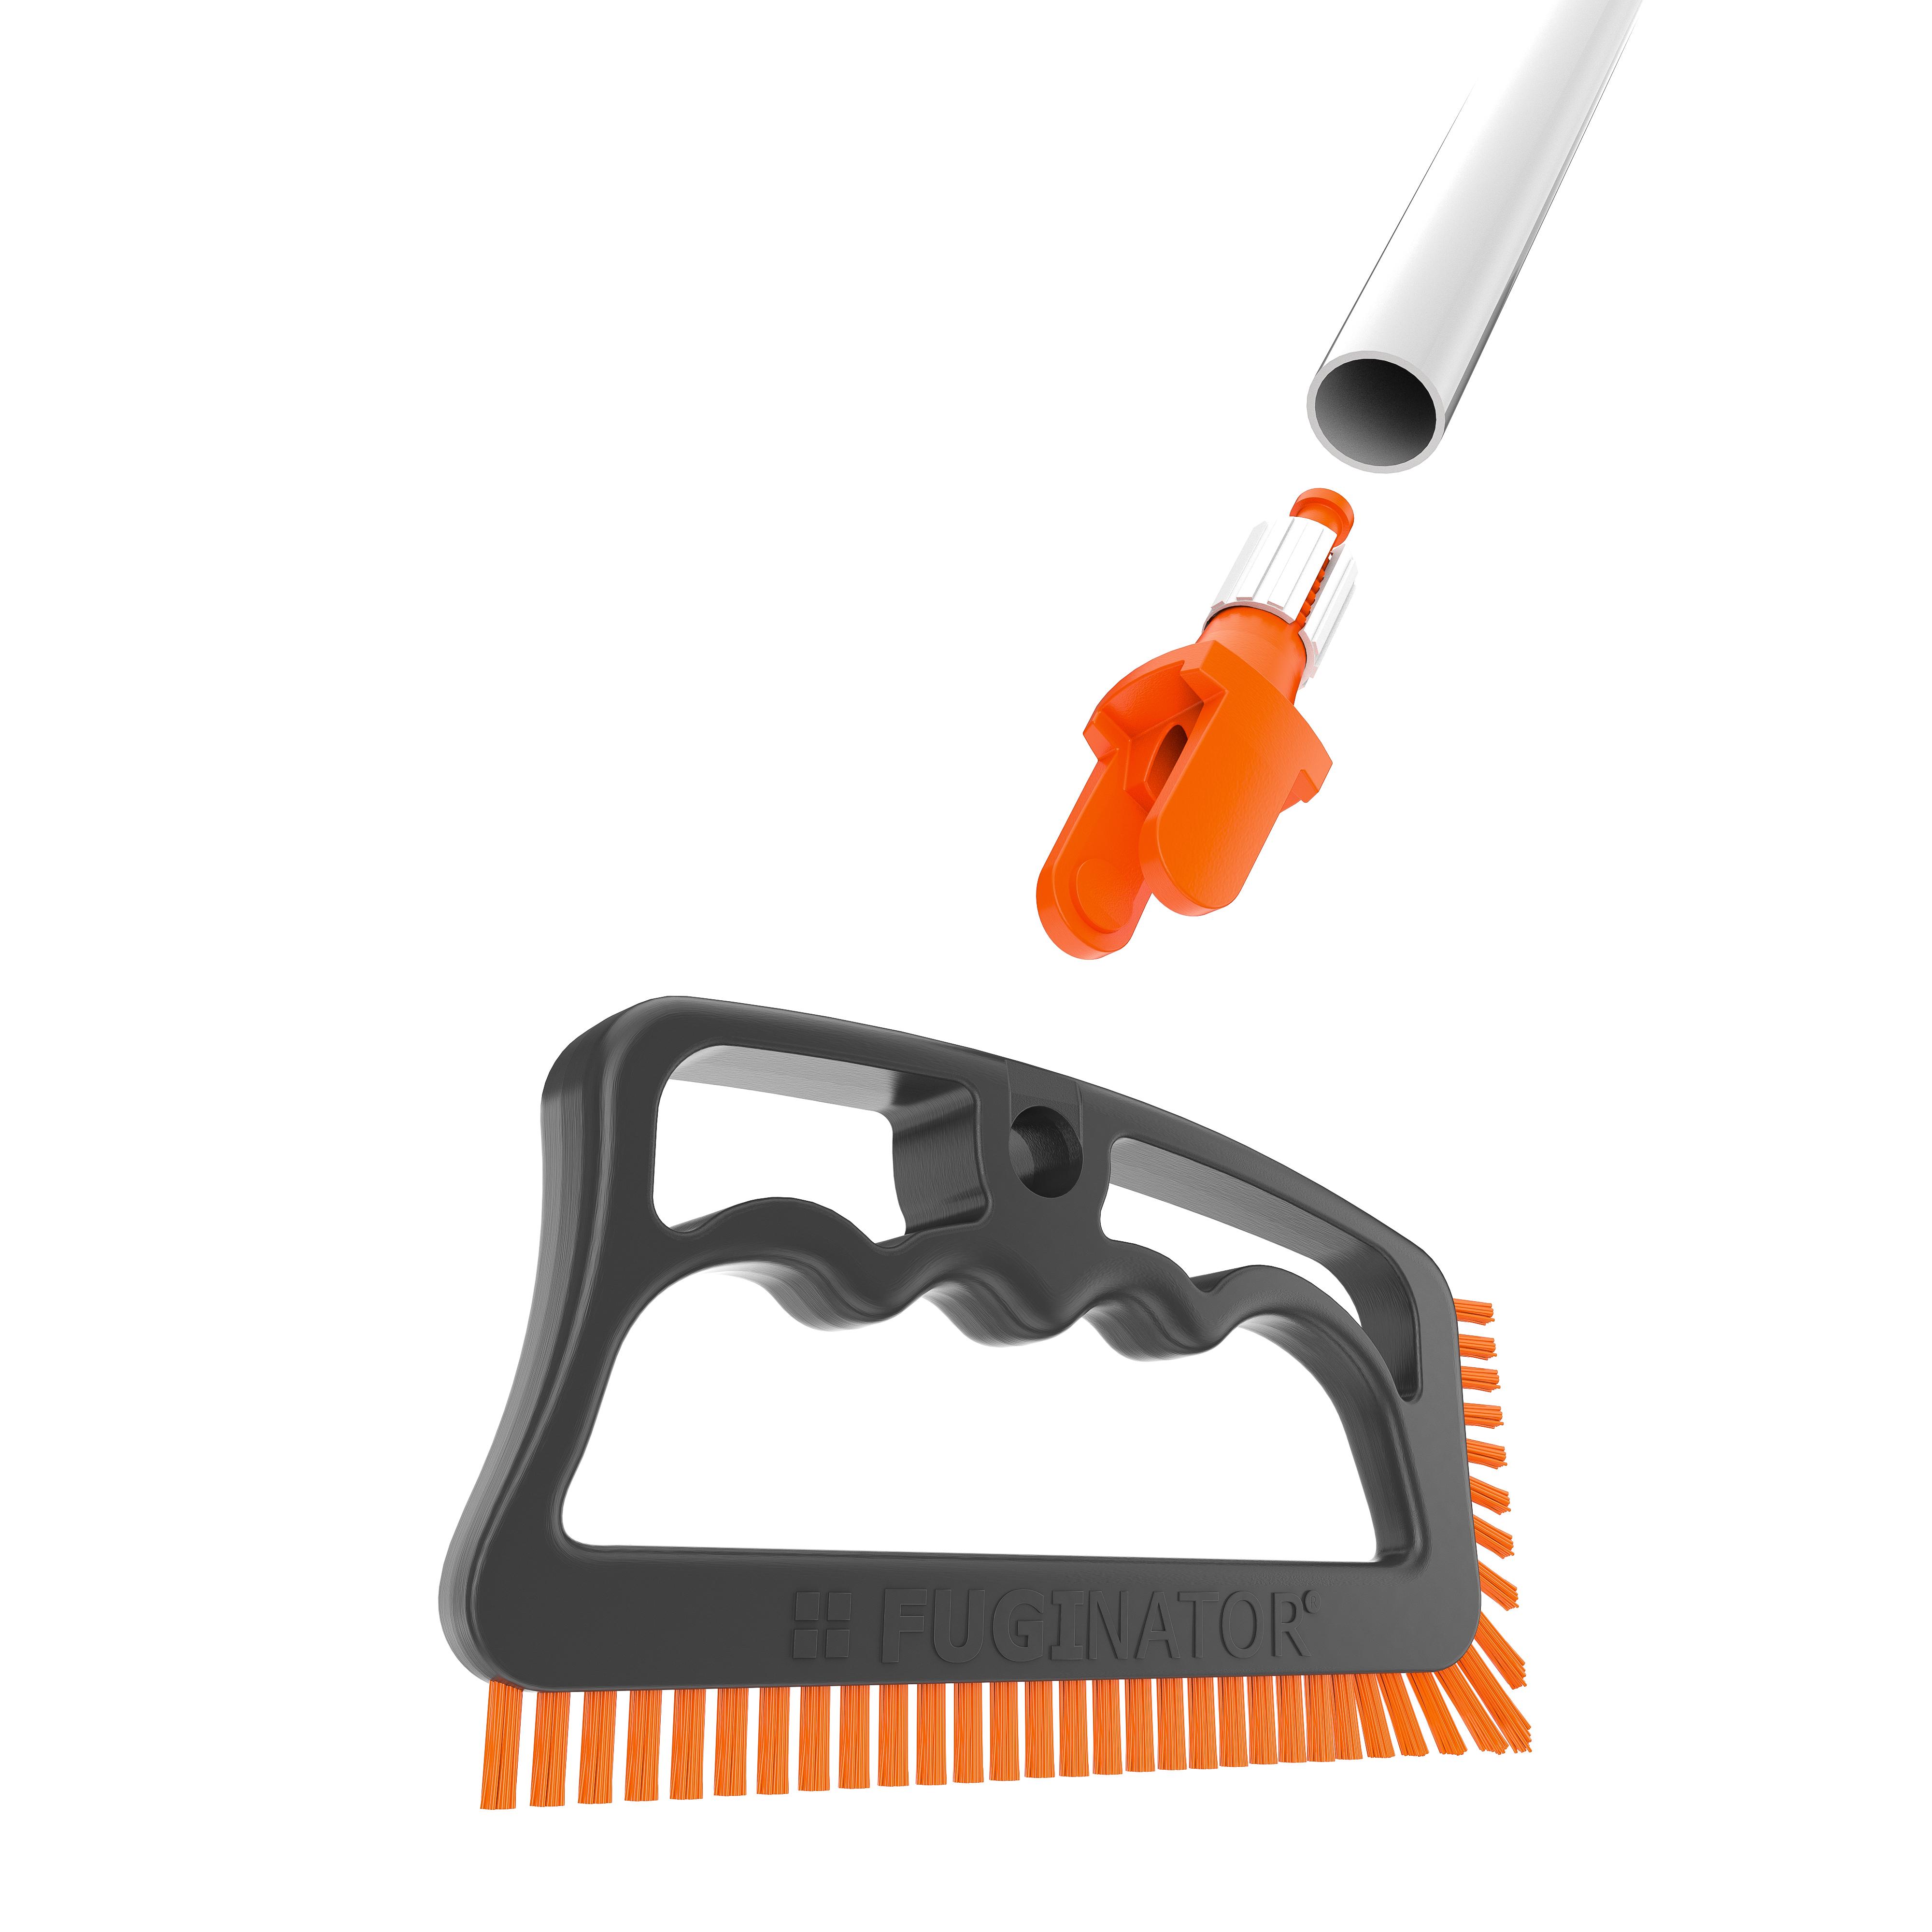 AdapterDreiteilig_V01_AdapterEUMulti_grau-orange-orange9qKXvmFsVrXiU